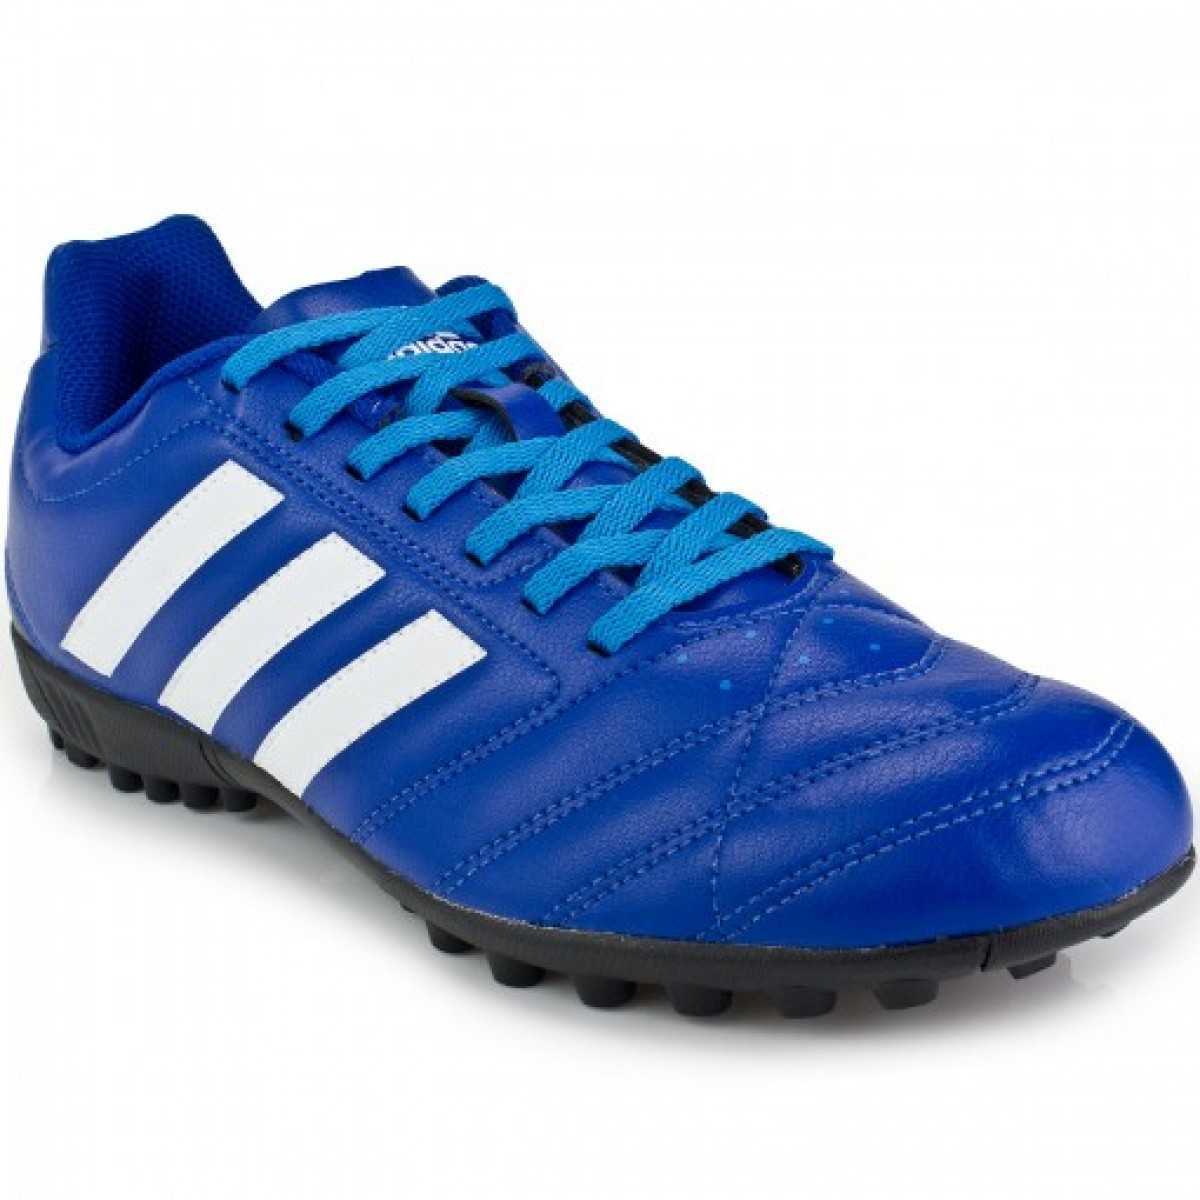 Chuteira Society Adidas Goletto V Tf Azul - Compre Agora  1394c43c9e183